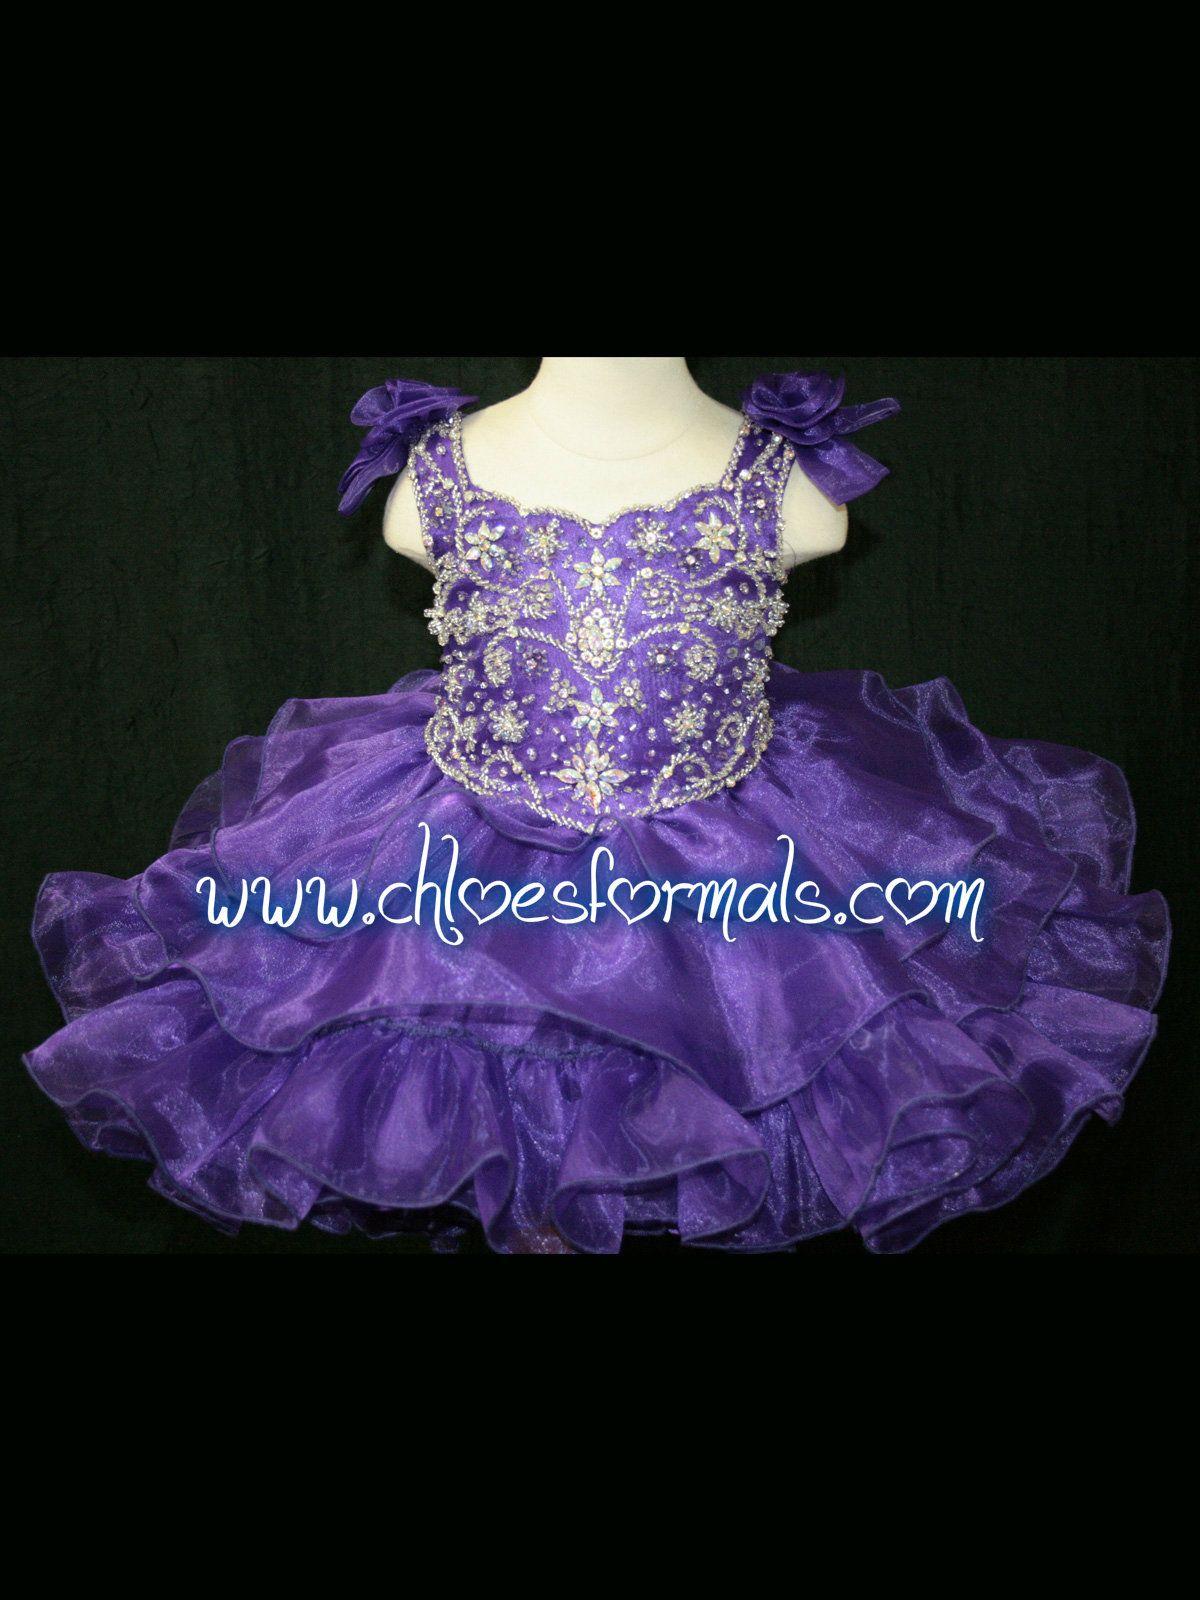 Sizes 6 mths, 12 mths, 18 mths & 24 mths Color: Purple $238 $100 ...